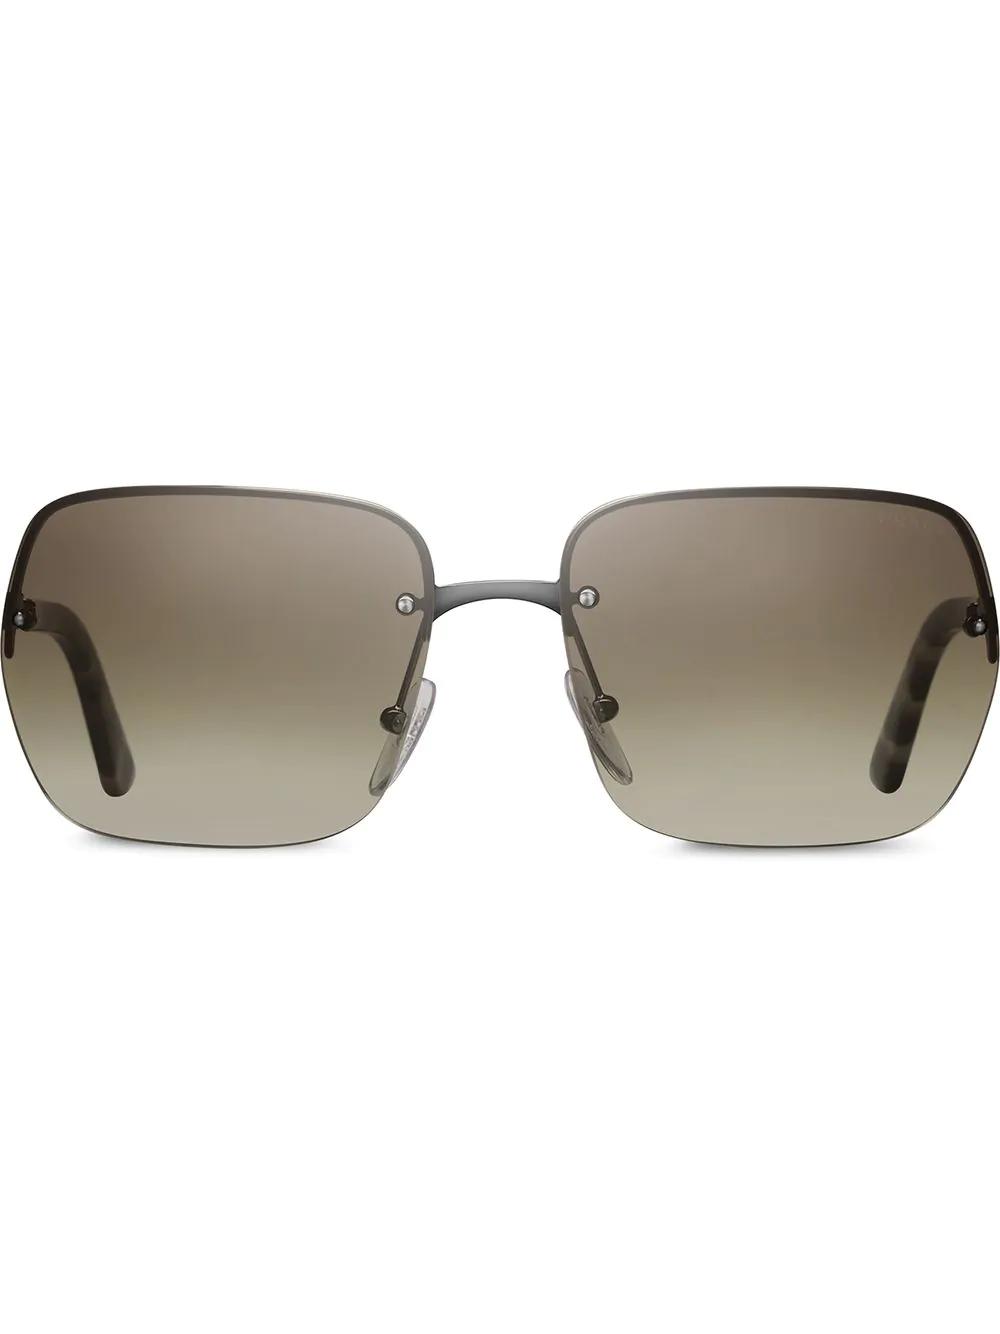 d14d321f7990a Prada Eyewear Square Frame Sunglasses - Neutrals